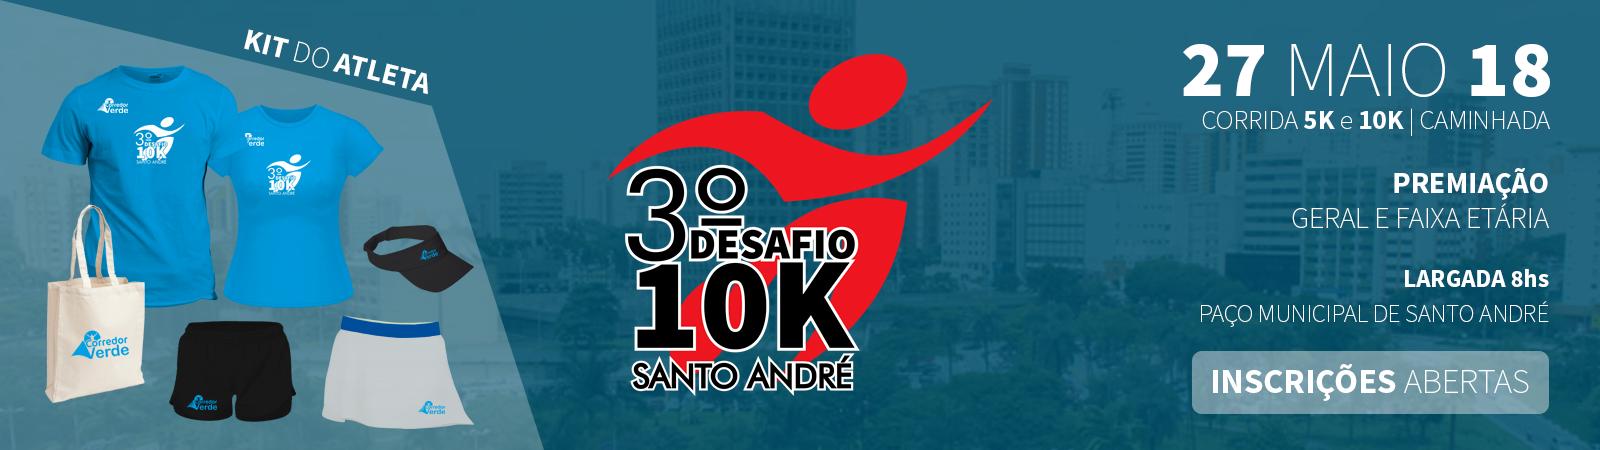 3° Desafio 10k - Santo André - Imagem de topo